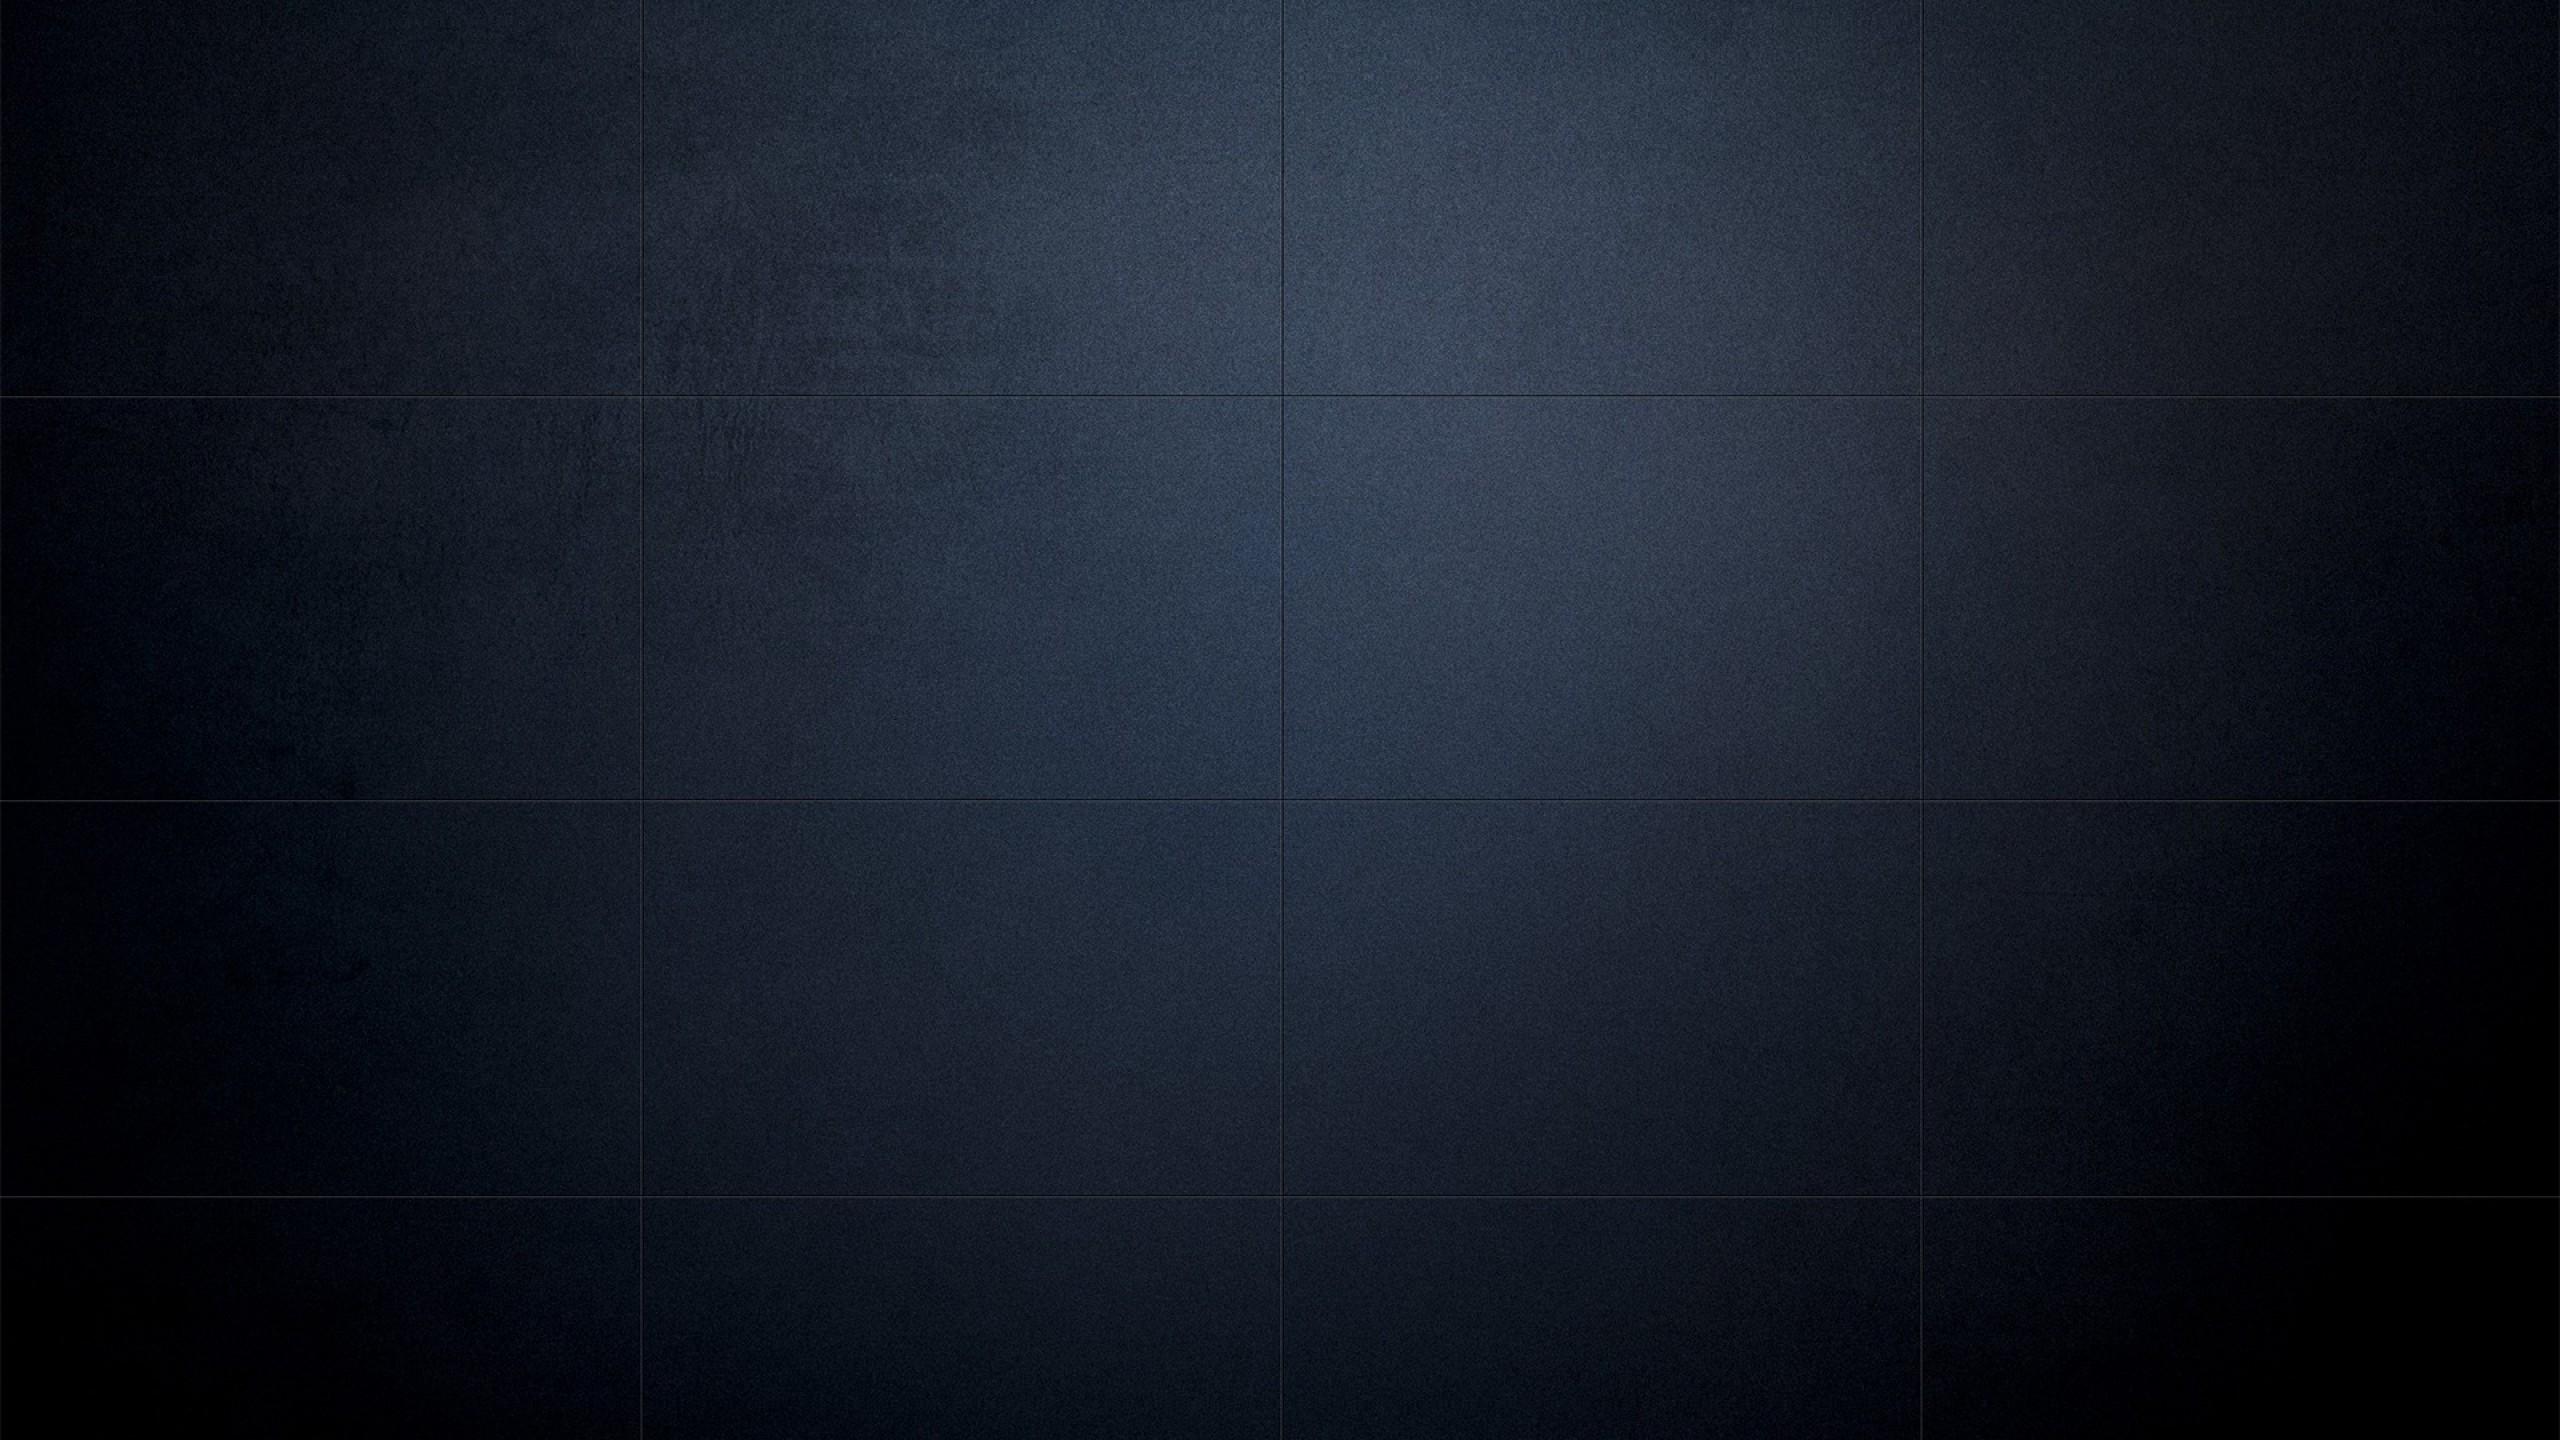 Wallpaper walls, background, black, stripes, texture